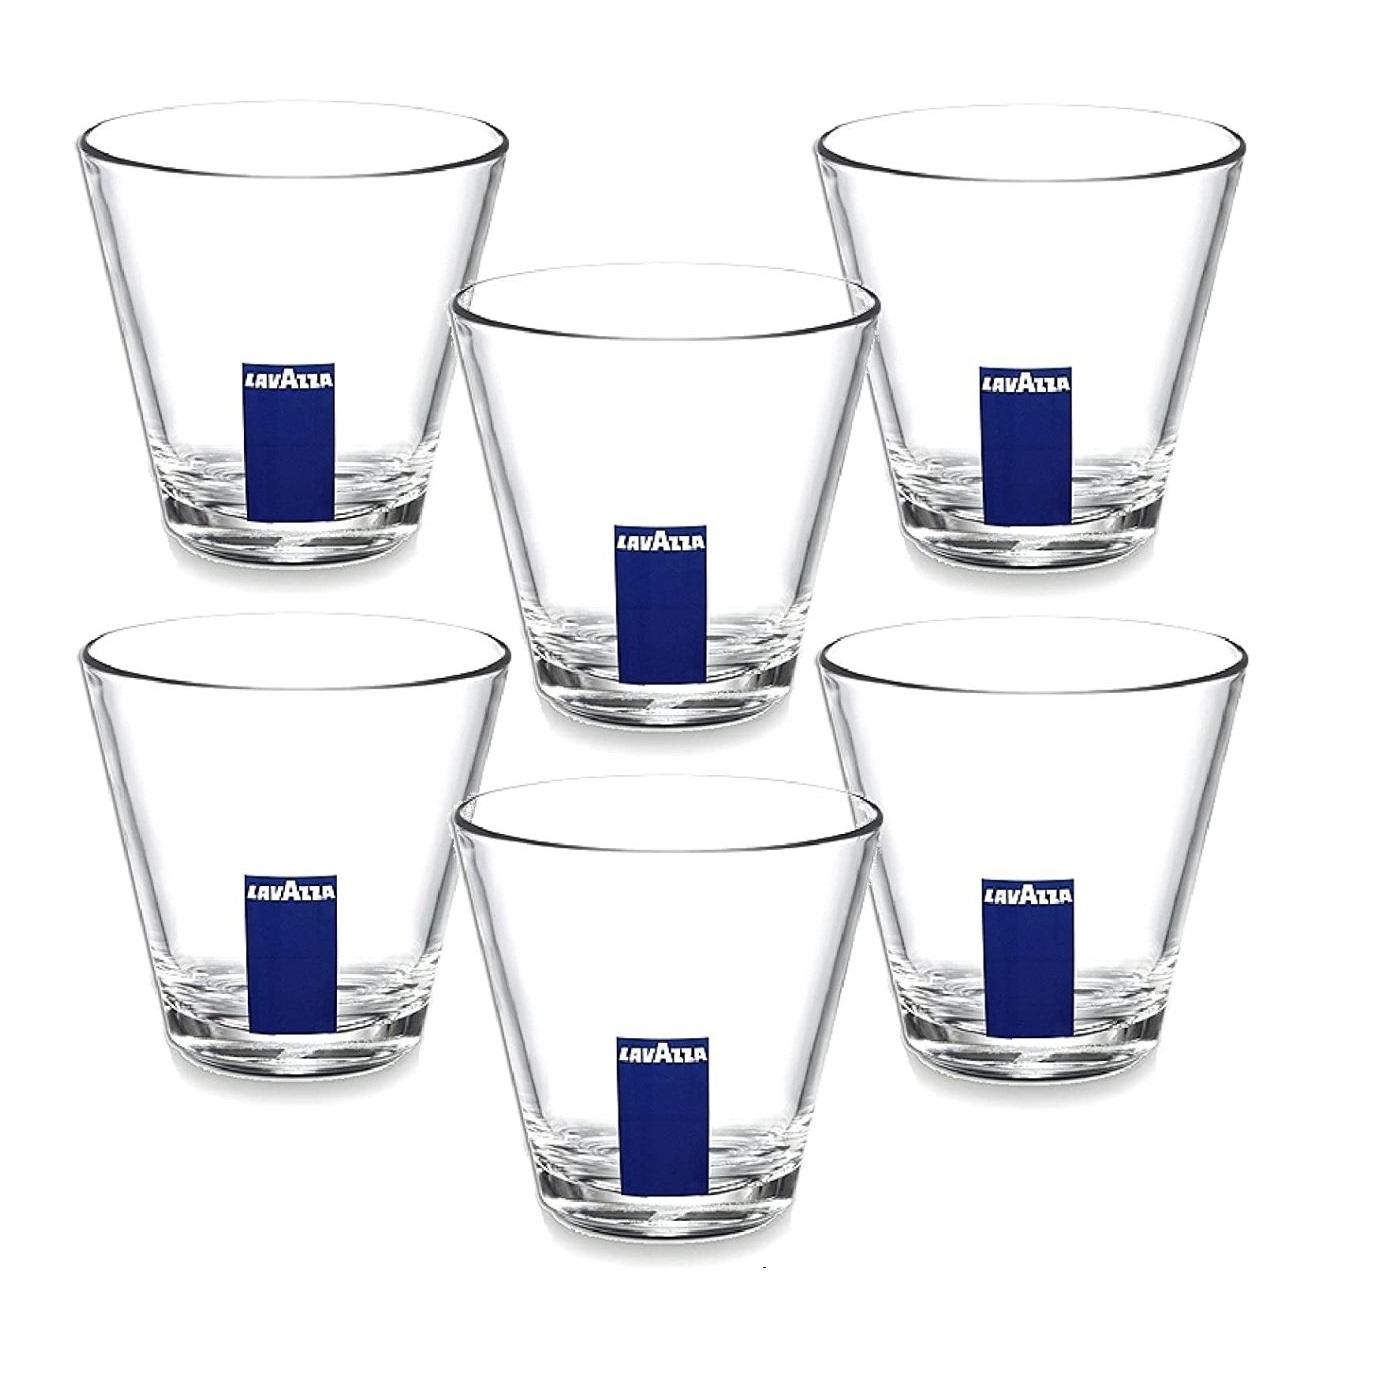 Lavazza pahare sticla medii 320 ml set 12 buc PLA3222